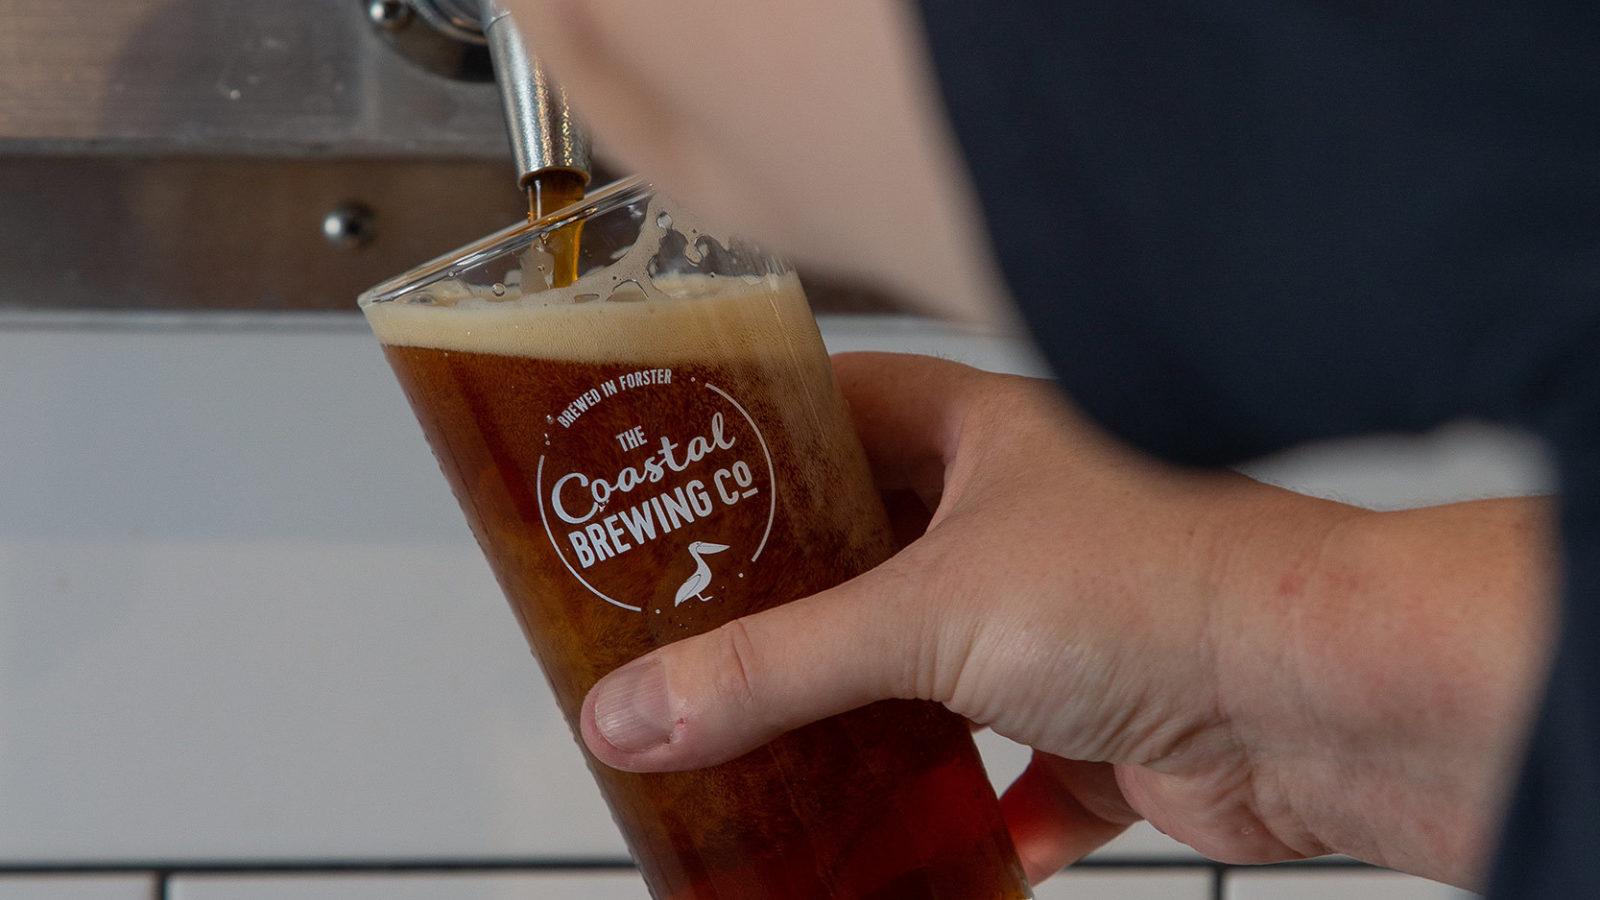 Glft coastal brewing local micro brewery